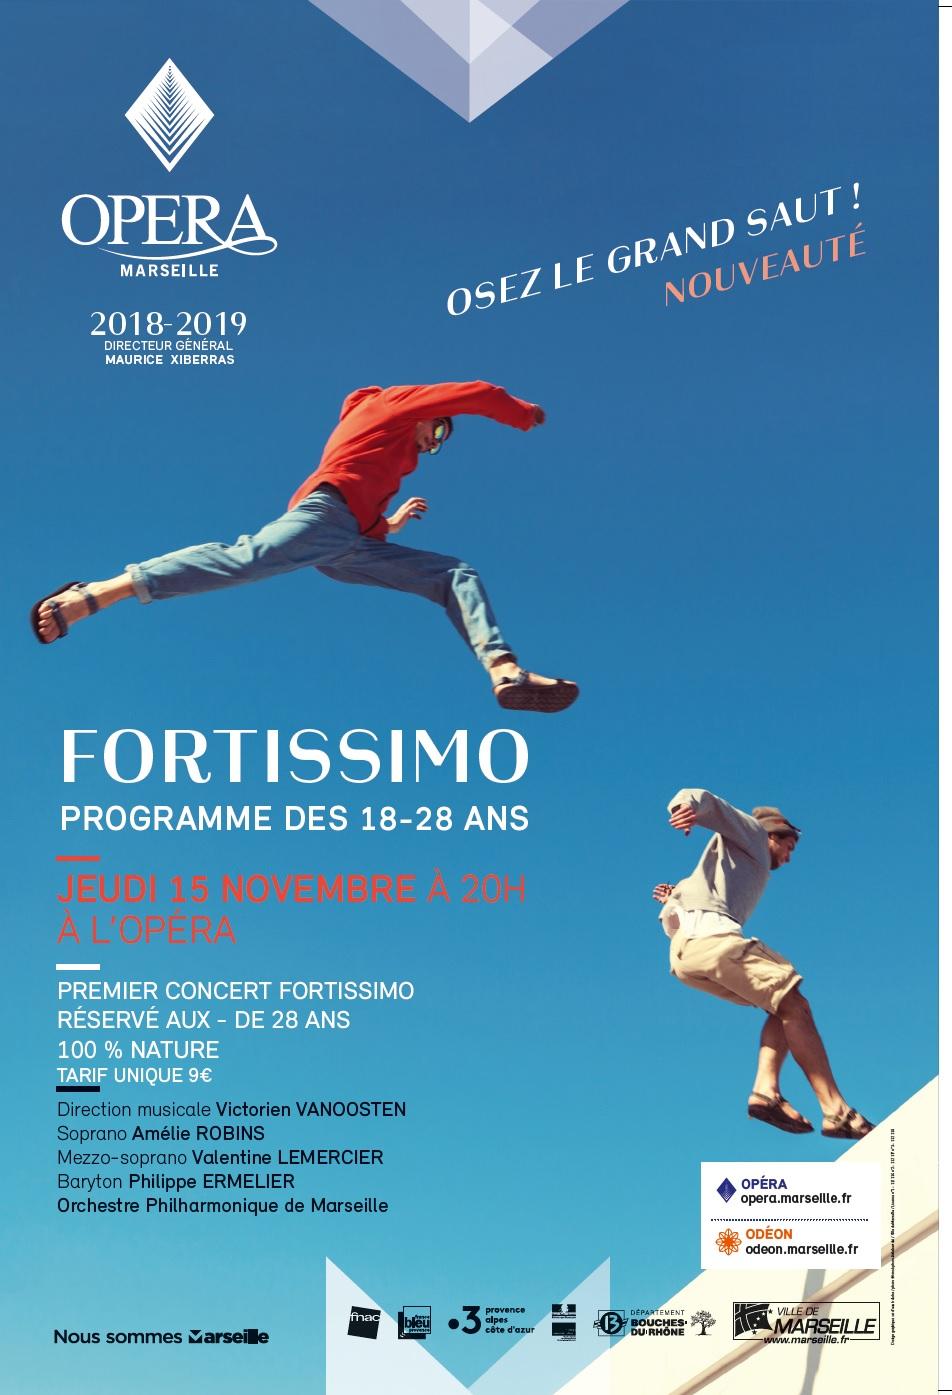 Concert Fotissimo Opéra 15.11.18